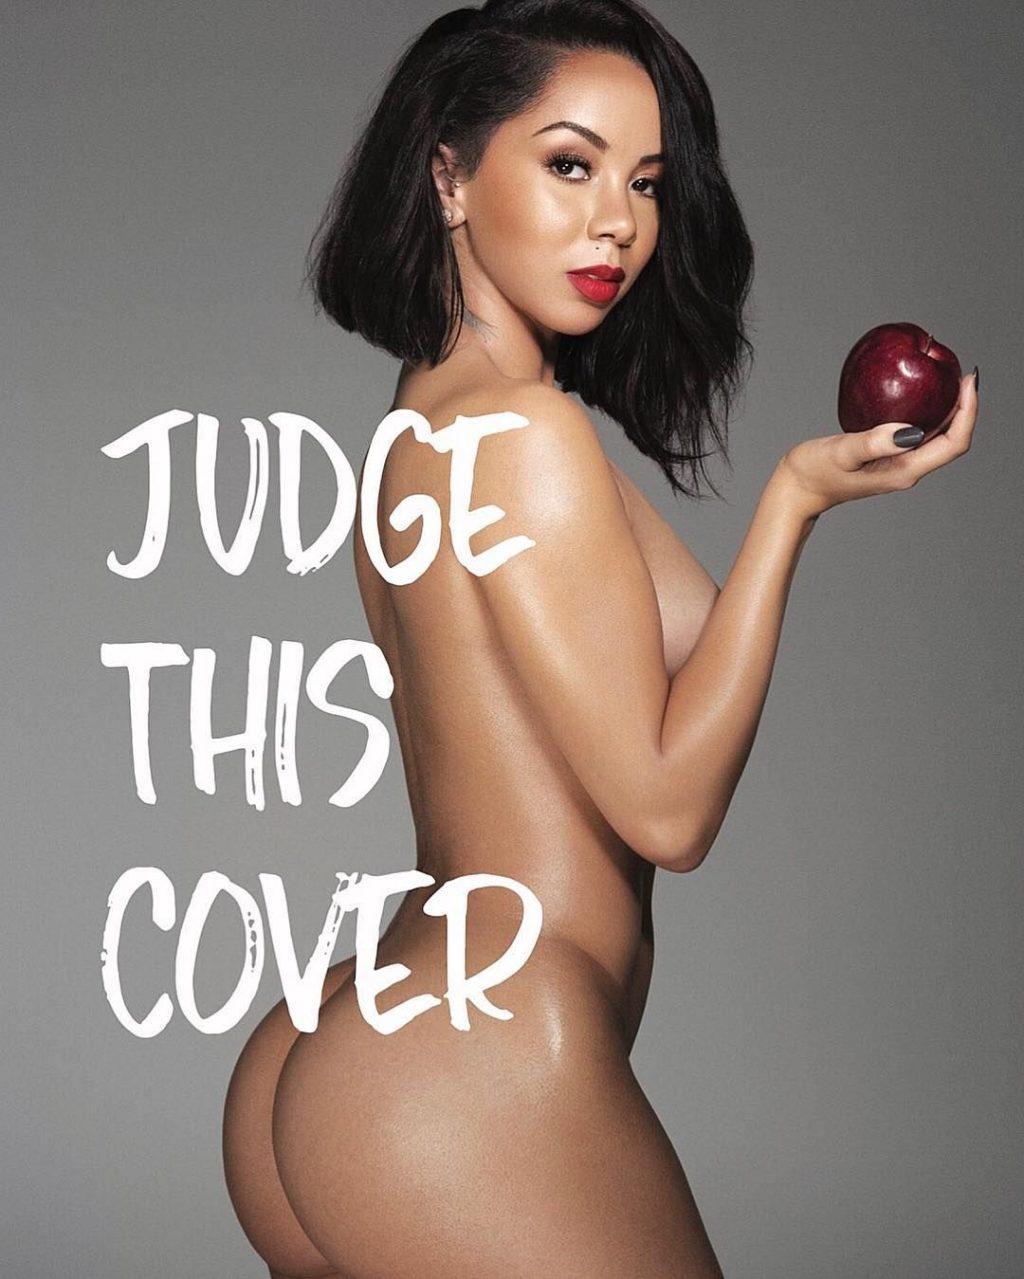 Amelle Berrabah Nude brittany renner naked (3 photos) – ( ͡° ͜ʖ ͡°)  the